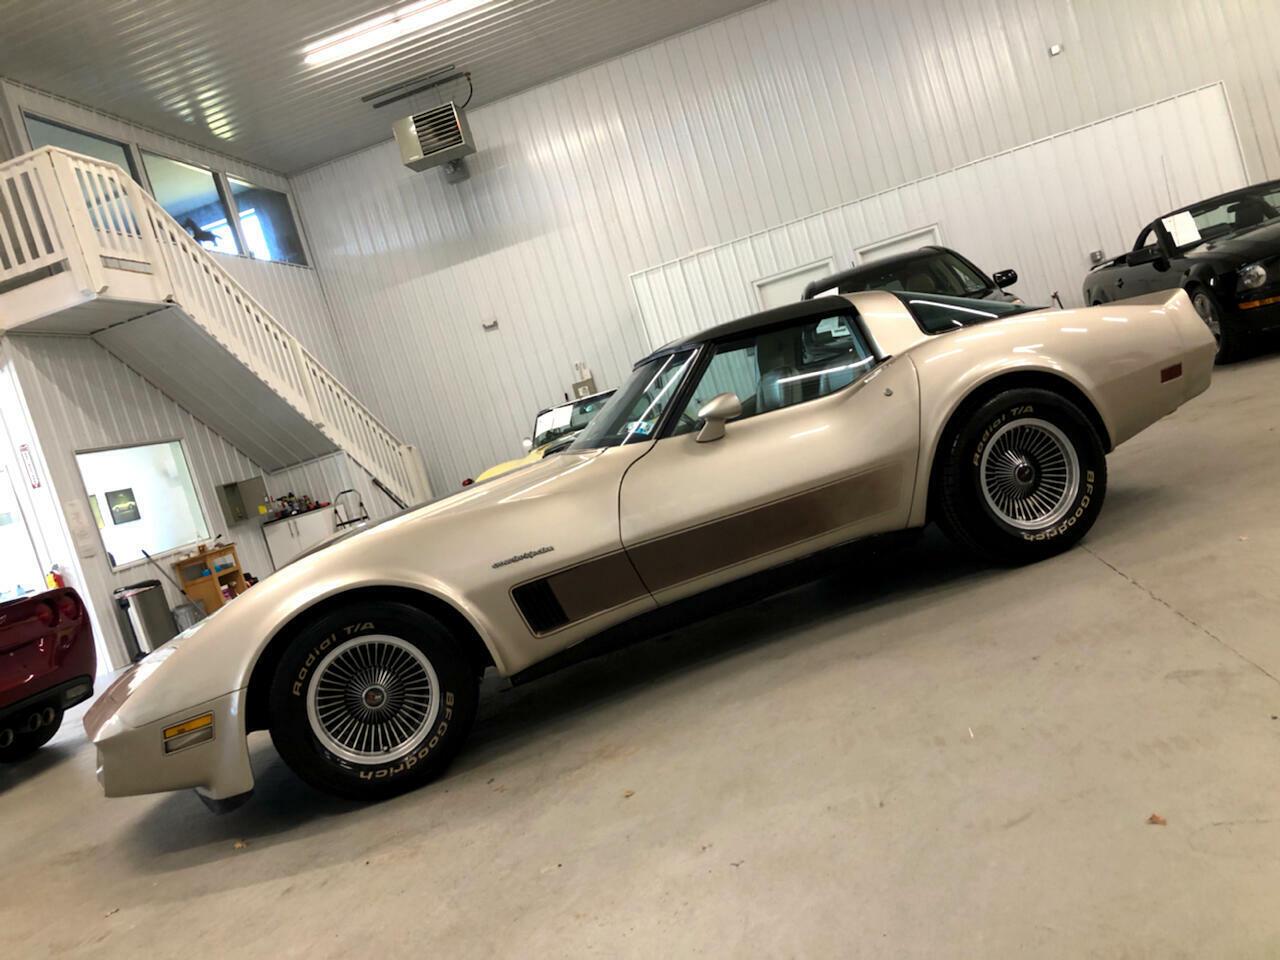 1982 Silver Chevrolet Corvette     C3 Corvette Photo 2